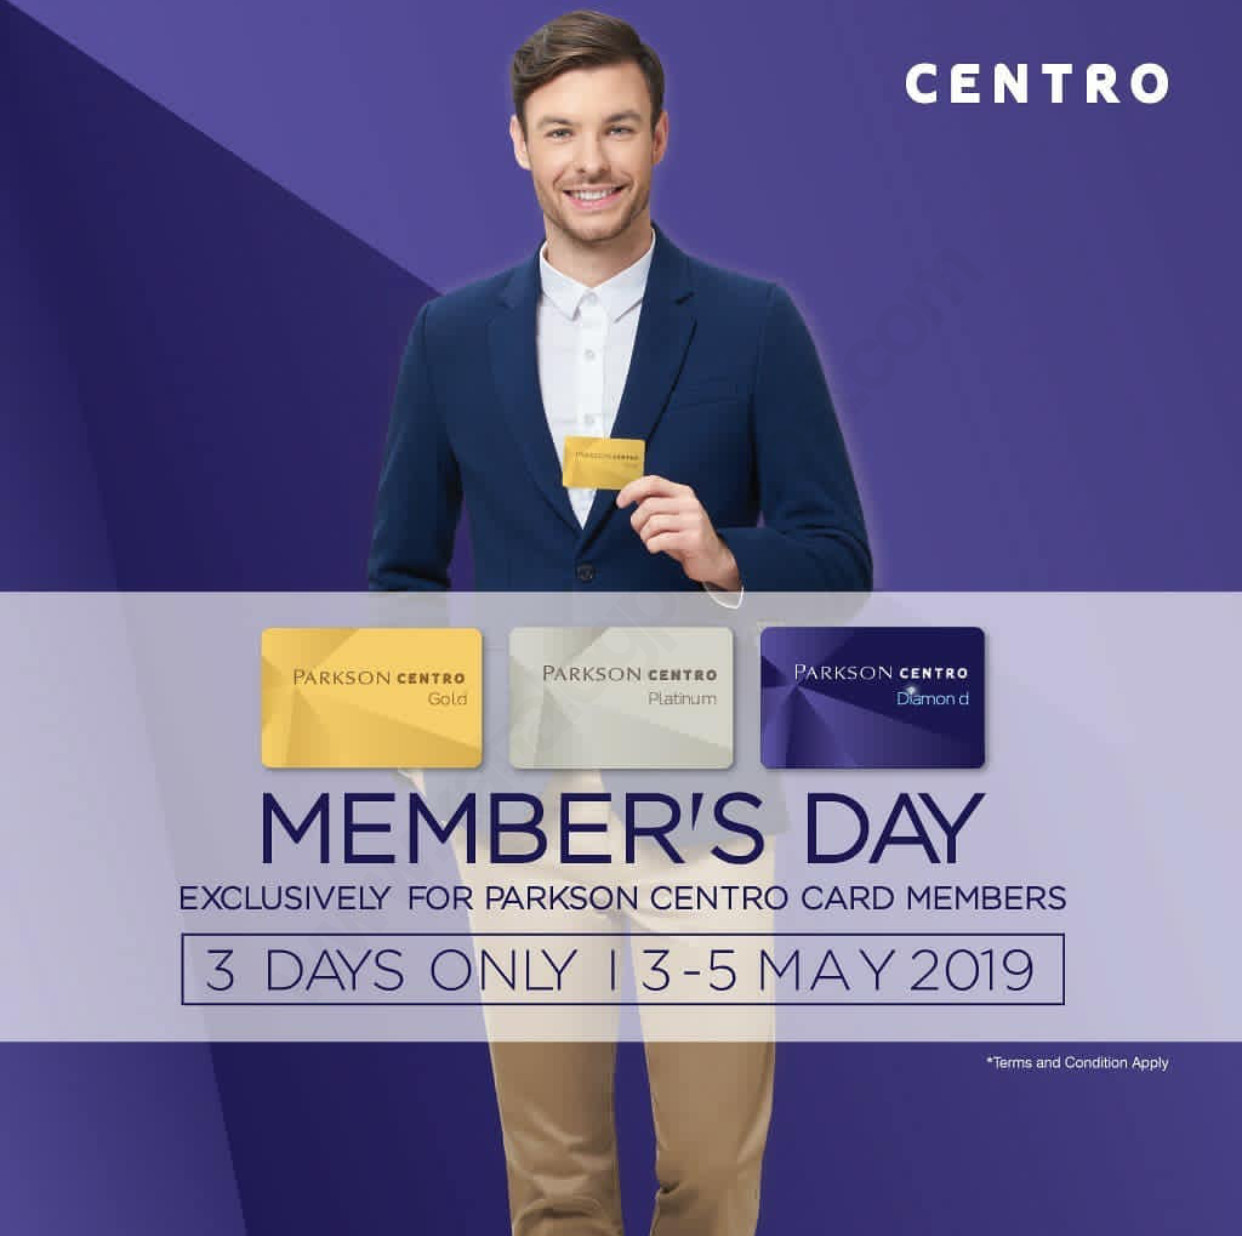 Diskon CENTRO dan PARKSON MEMBER'S DAY – Penawaran spesial khusus untuk Member PARKSON CENTRO CARD